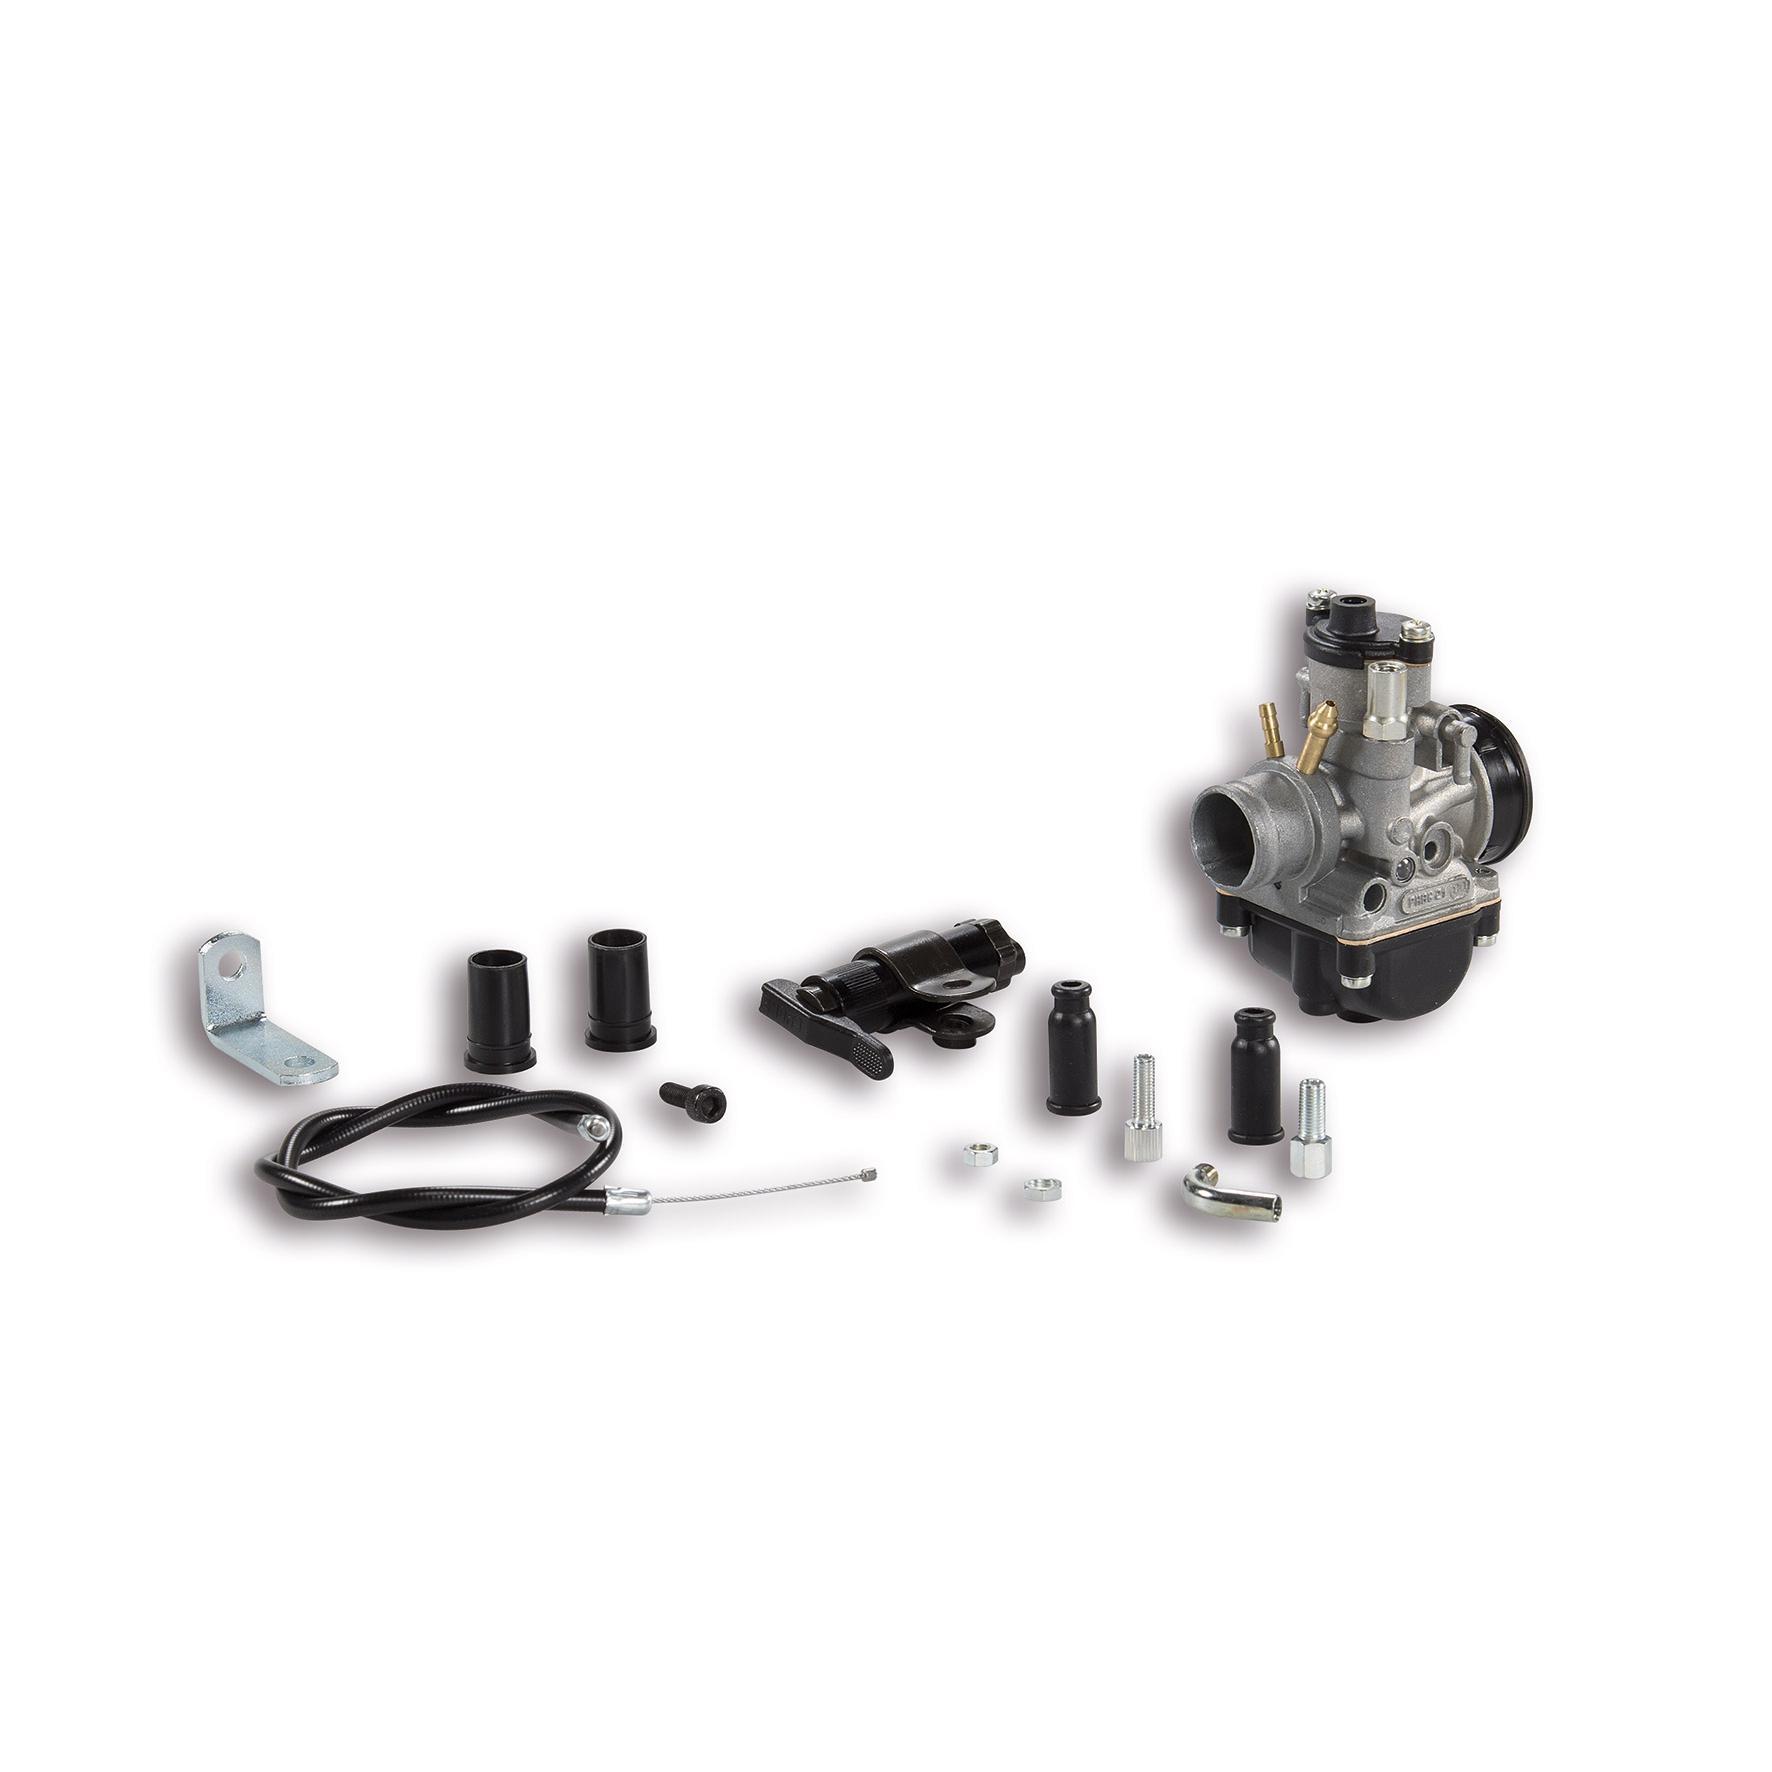 Kit carburateur Malossi PHBG 21 BD Piaggio Quartz Lc50